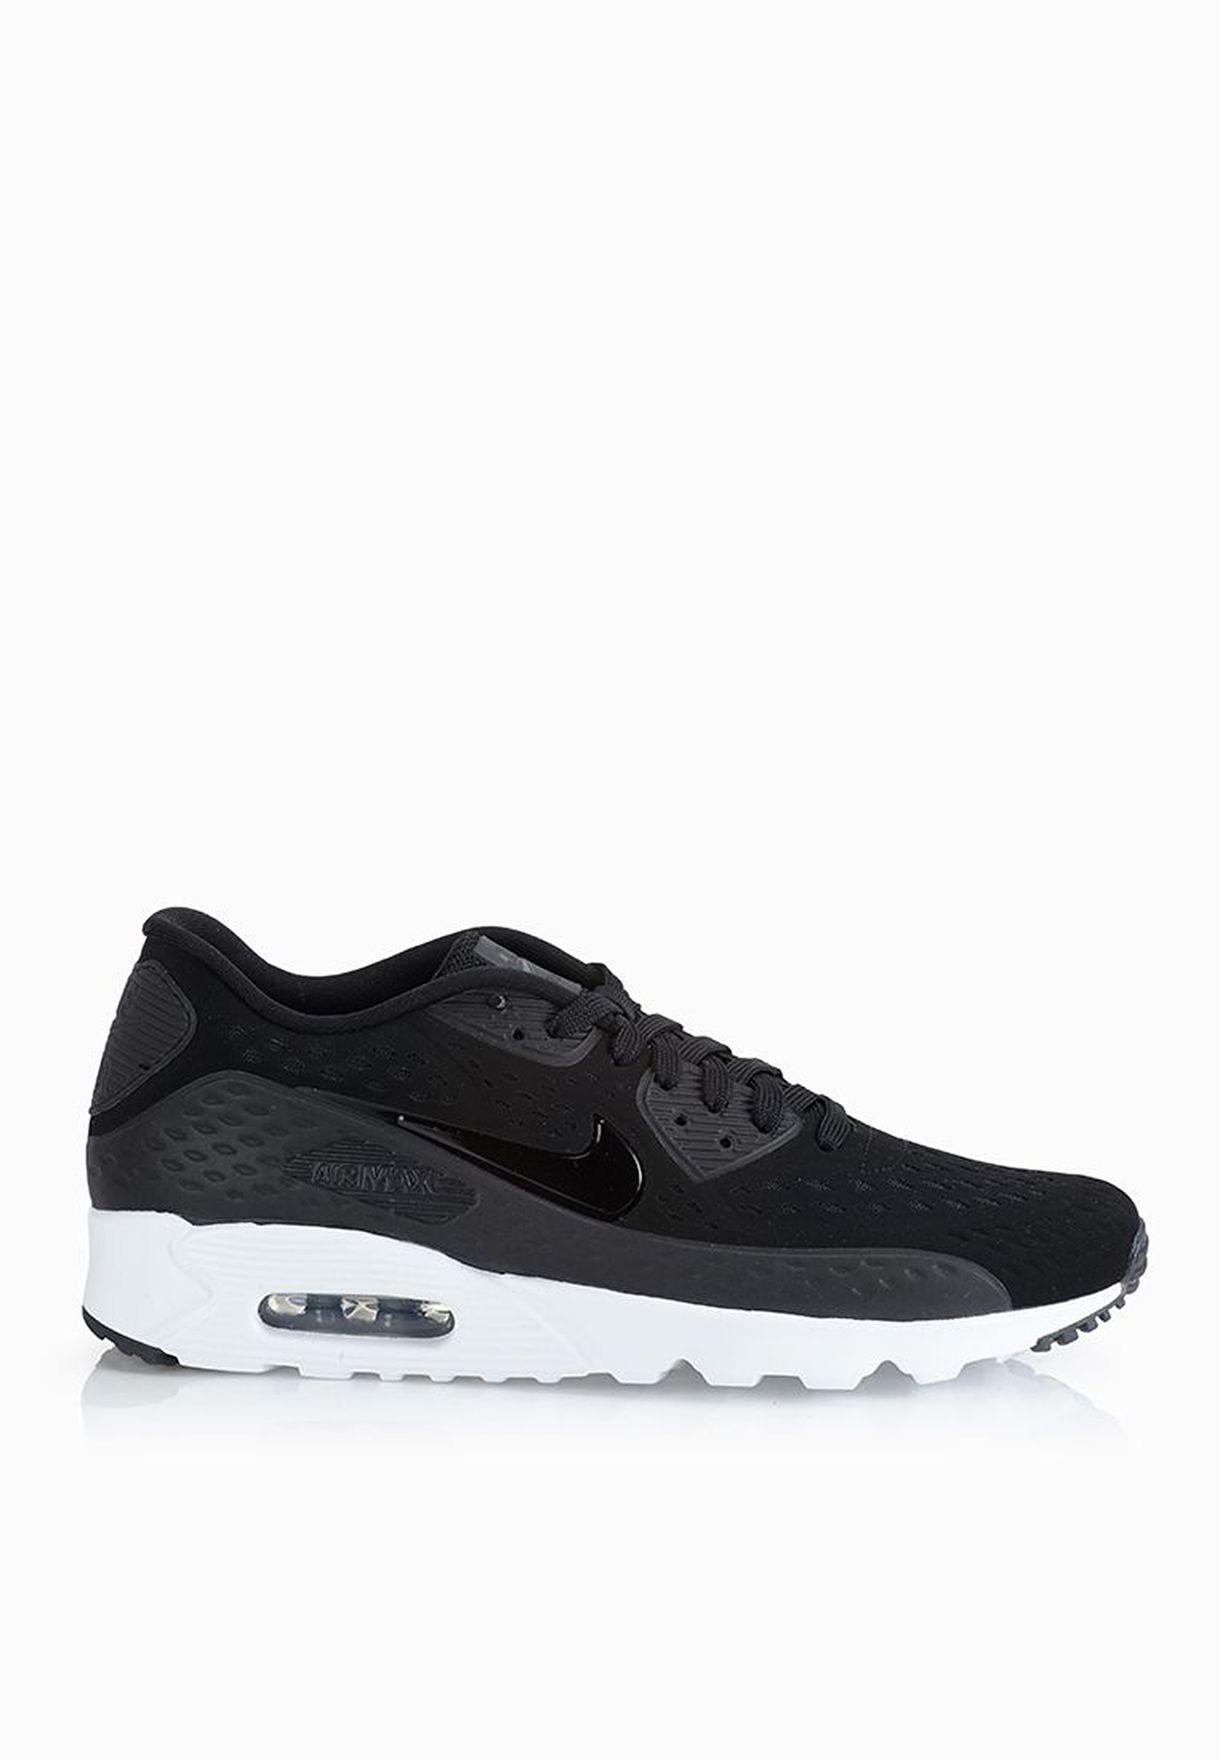 separation shoes dac4b 26384 Air Max 90 Ultra BR